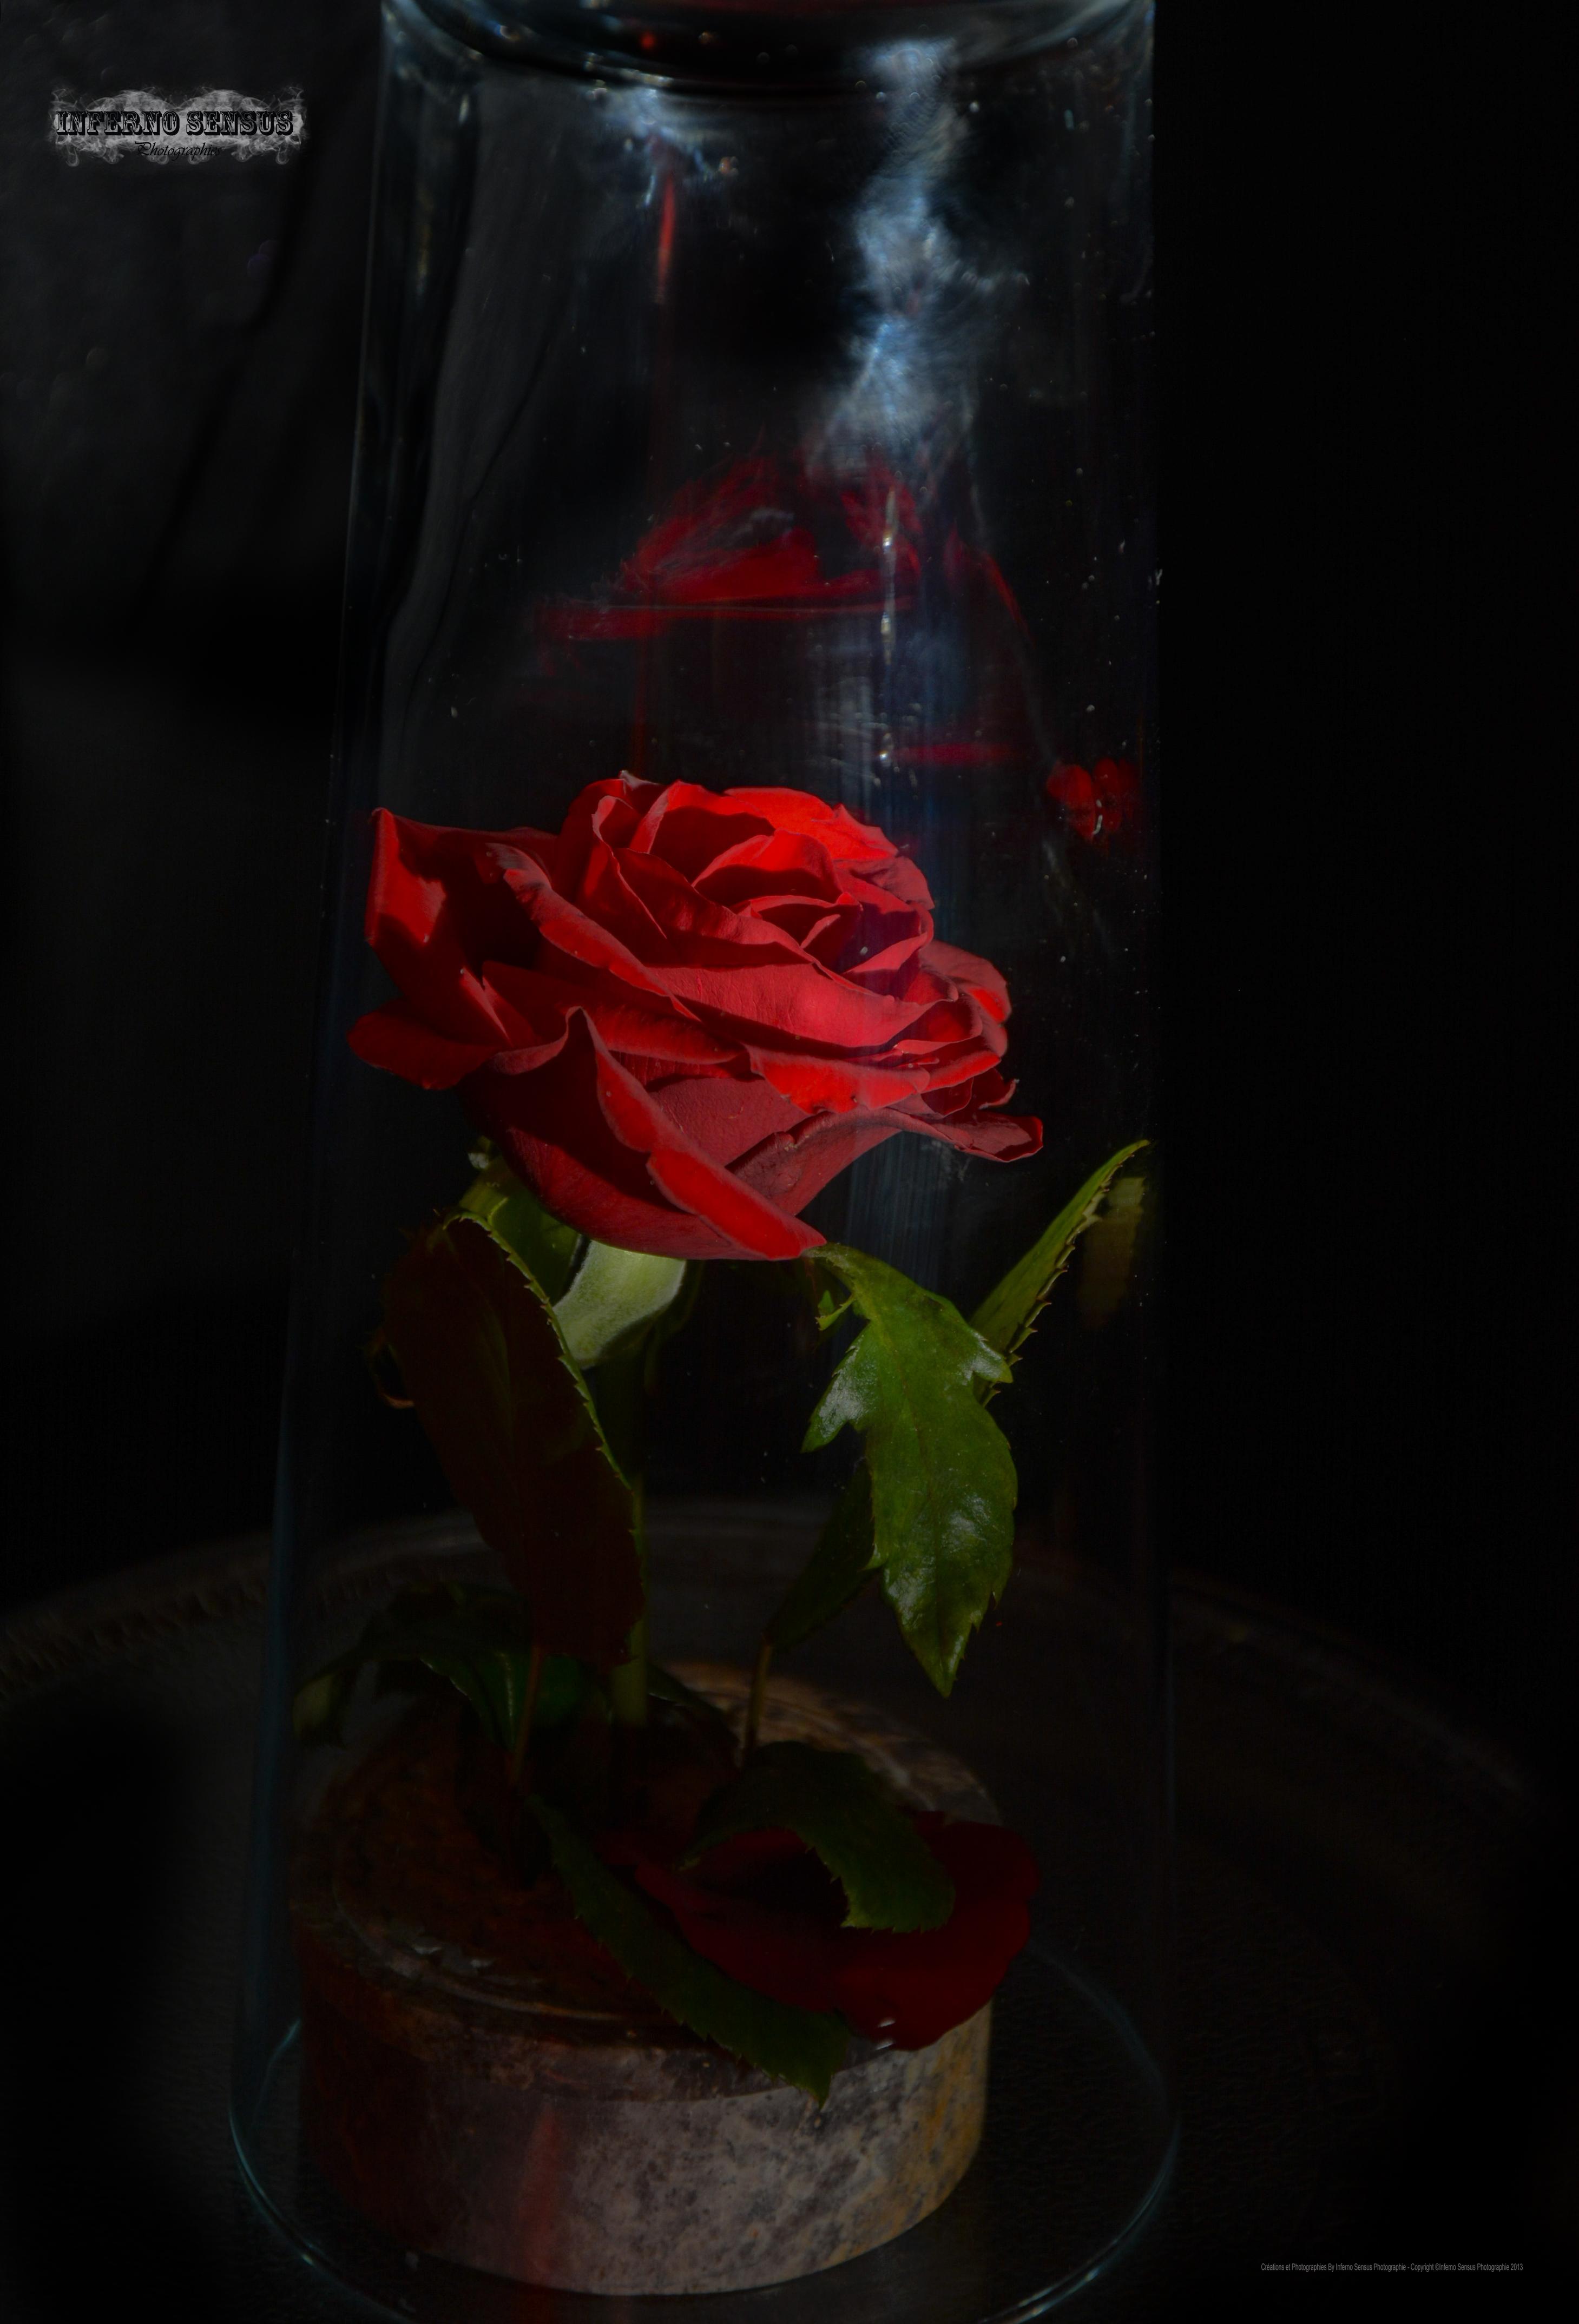 la rose de la belle et la bete 1 by inferno sensus on deviantart. Black Bedroom Furniture Sets. Home Design Ideas